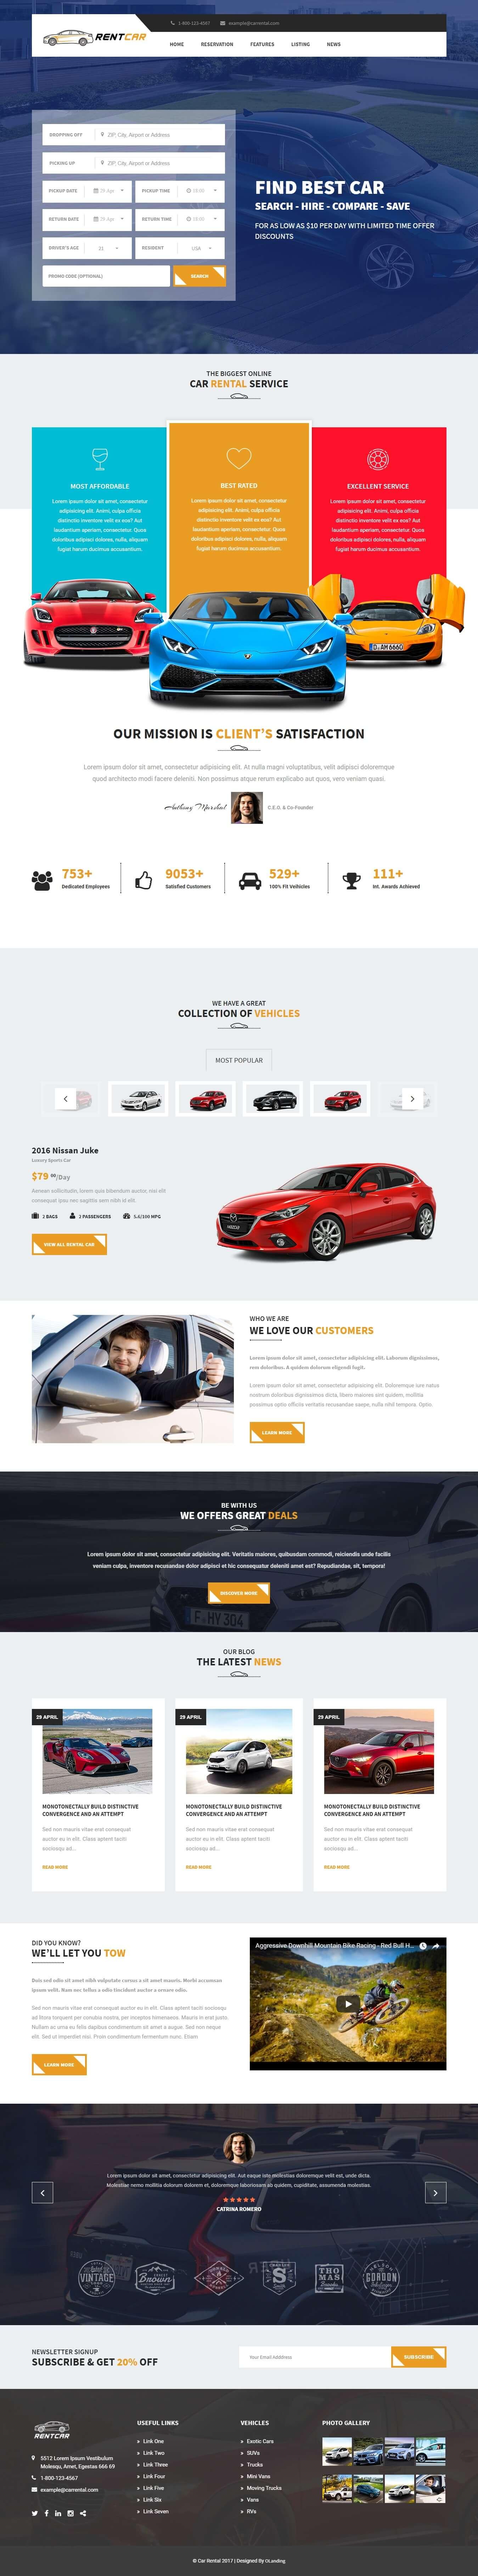 Rent Car - Responsive HTML Car Rental Landing Page Template